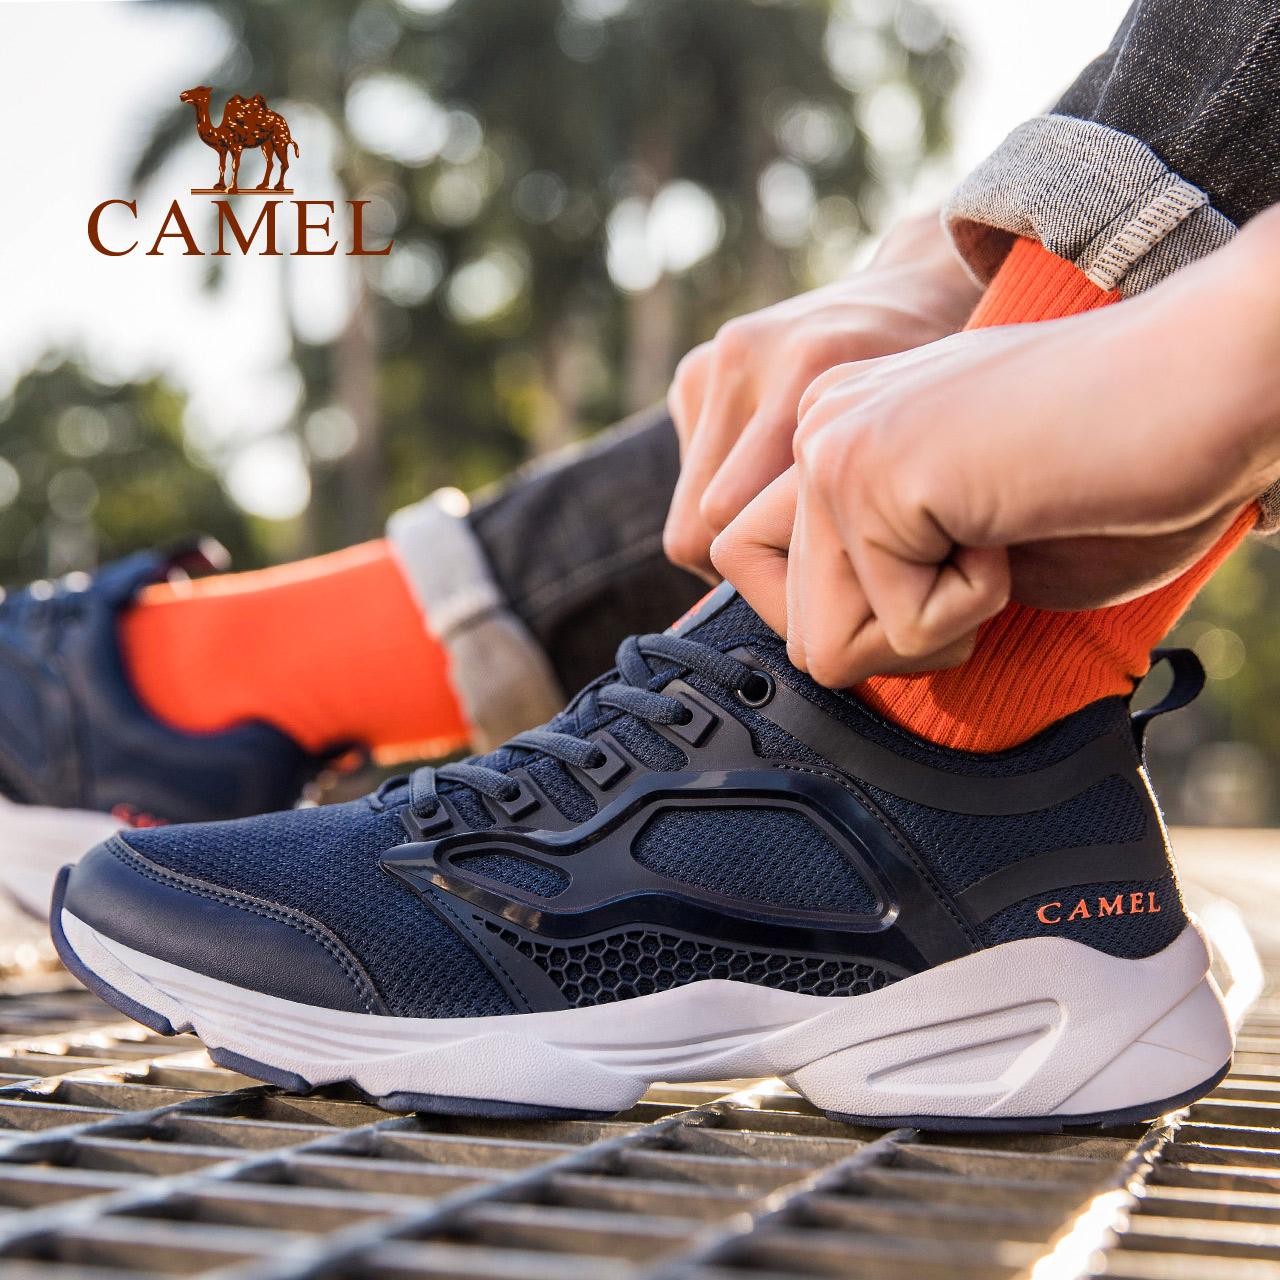 Camel/骆驼正品牌运动鞋防滑透气吸汗时尚男士减震休闲越野跑步鞋